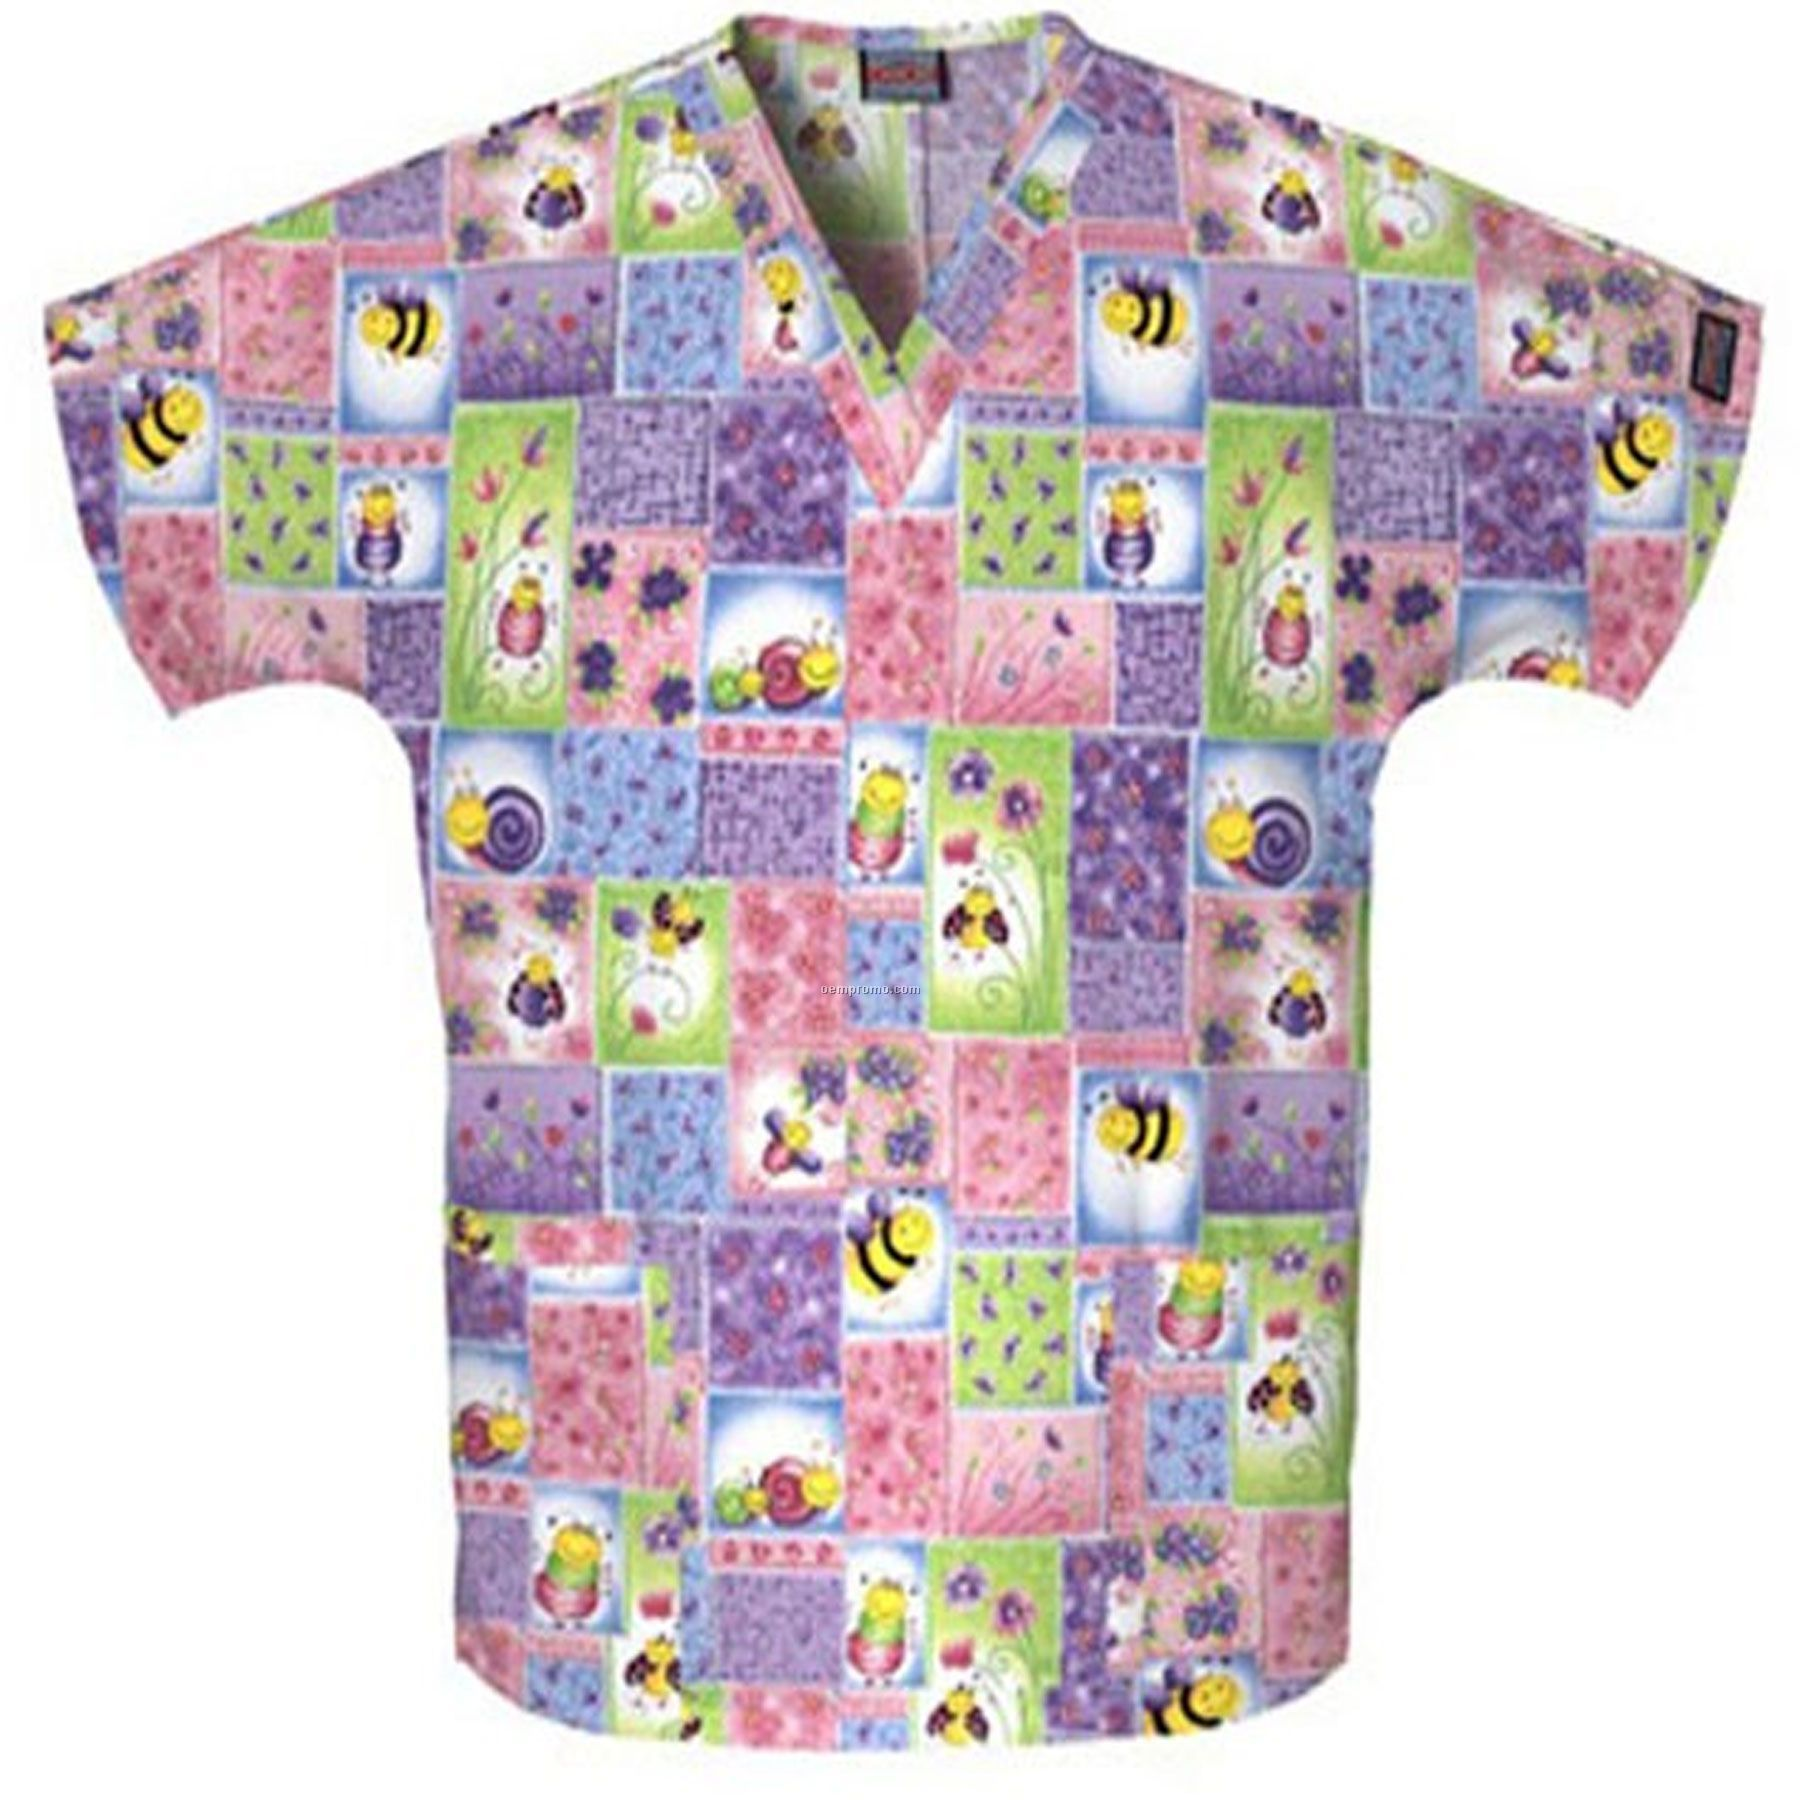 Unisex Two Pocket Top (Bee Yourself Print)